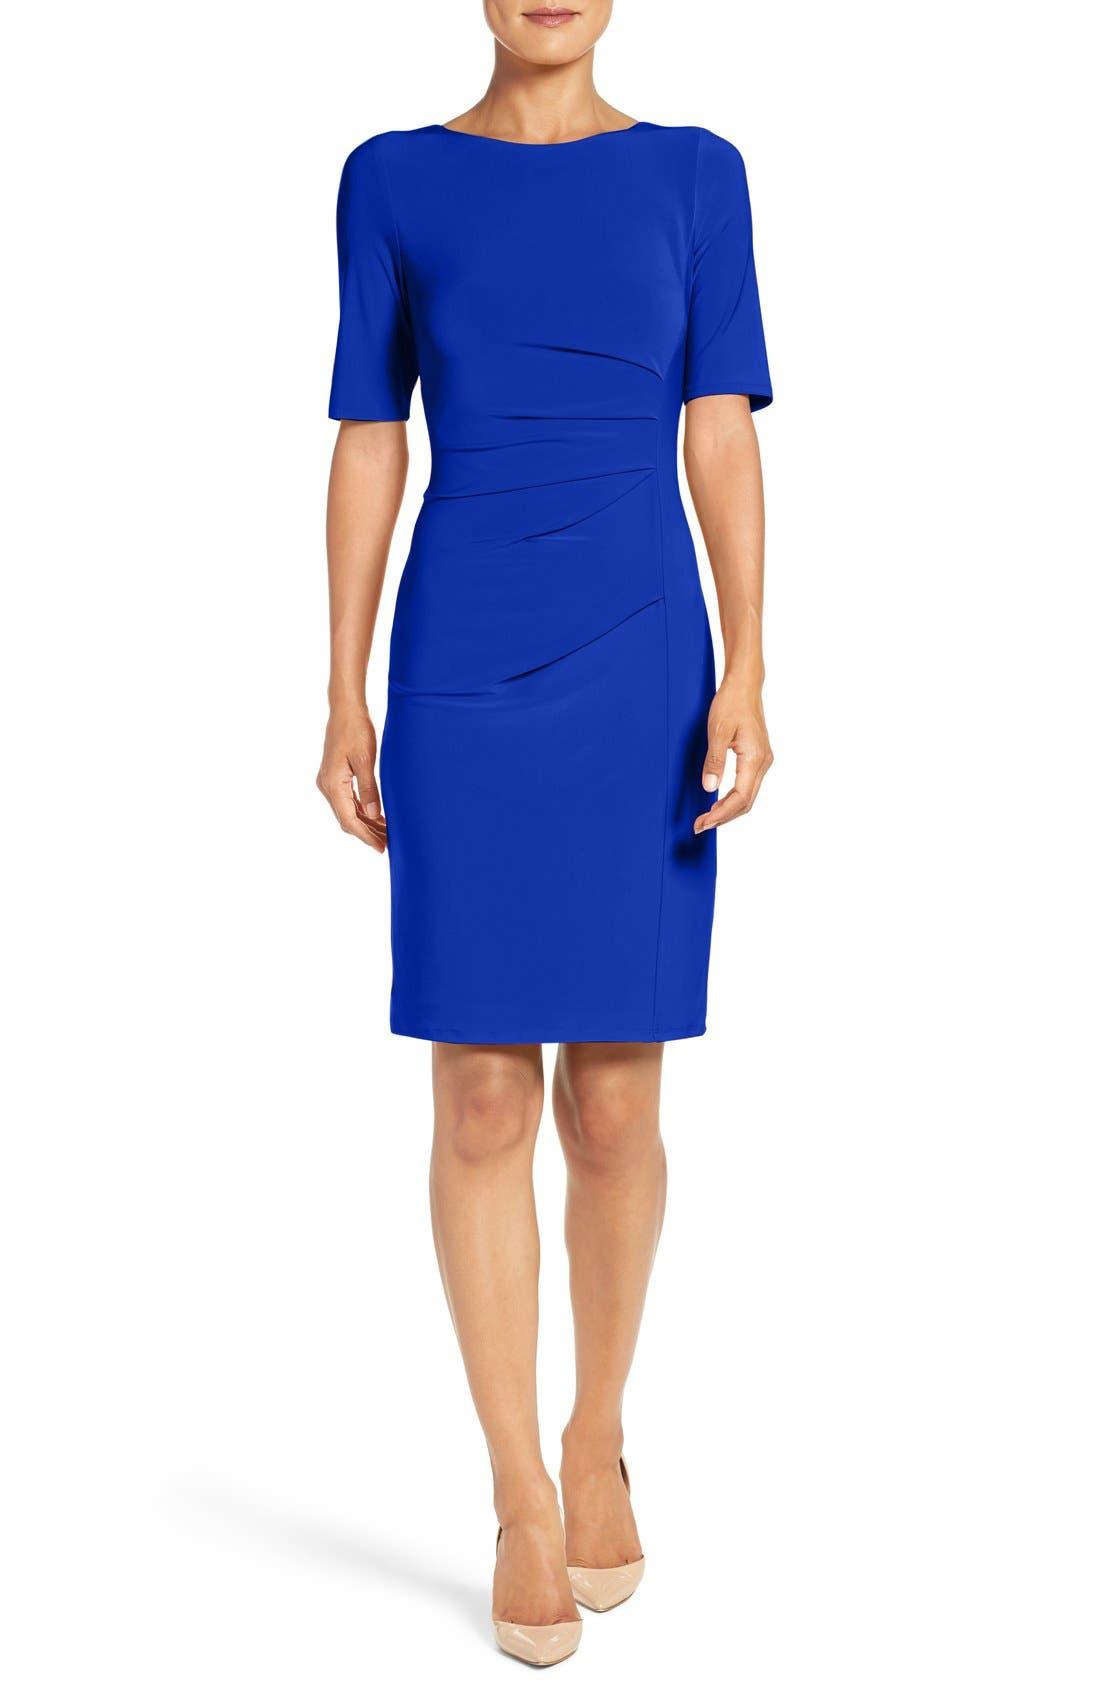 Alternate Image 1 Selected - Eliza J Ruched Jersey Sheath Dress (Regular & Petite)